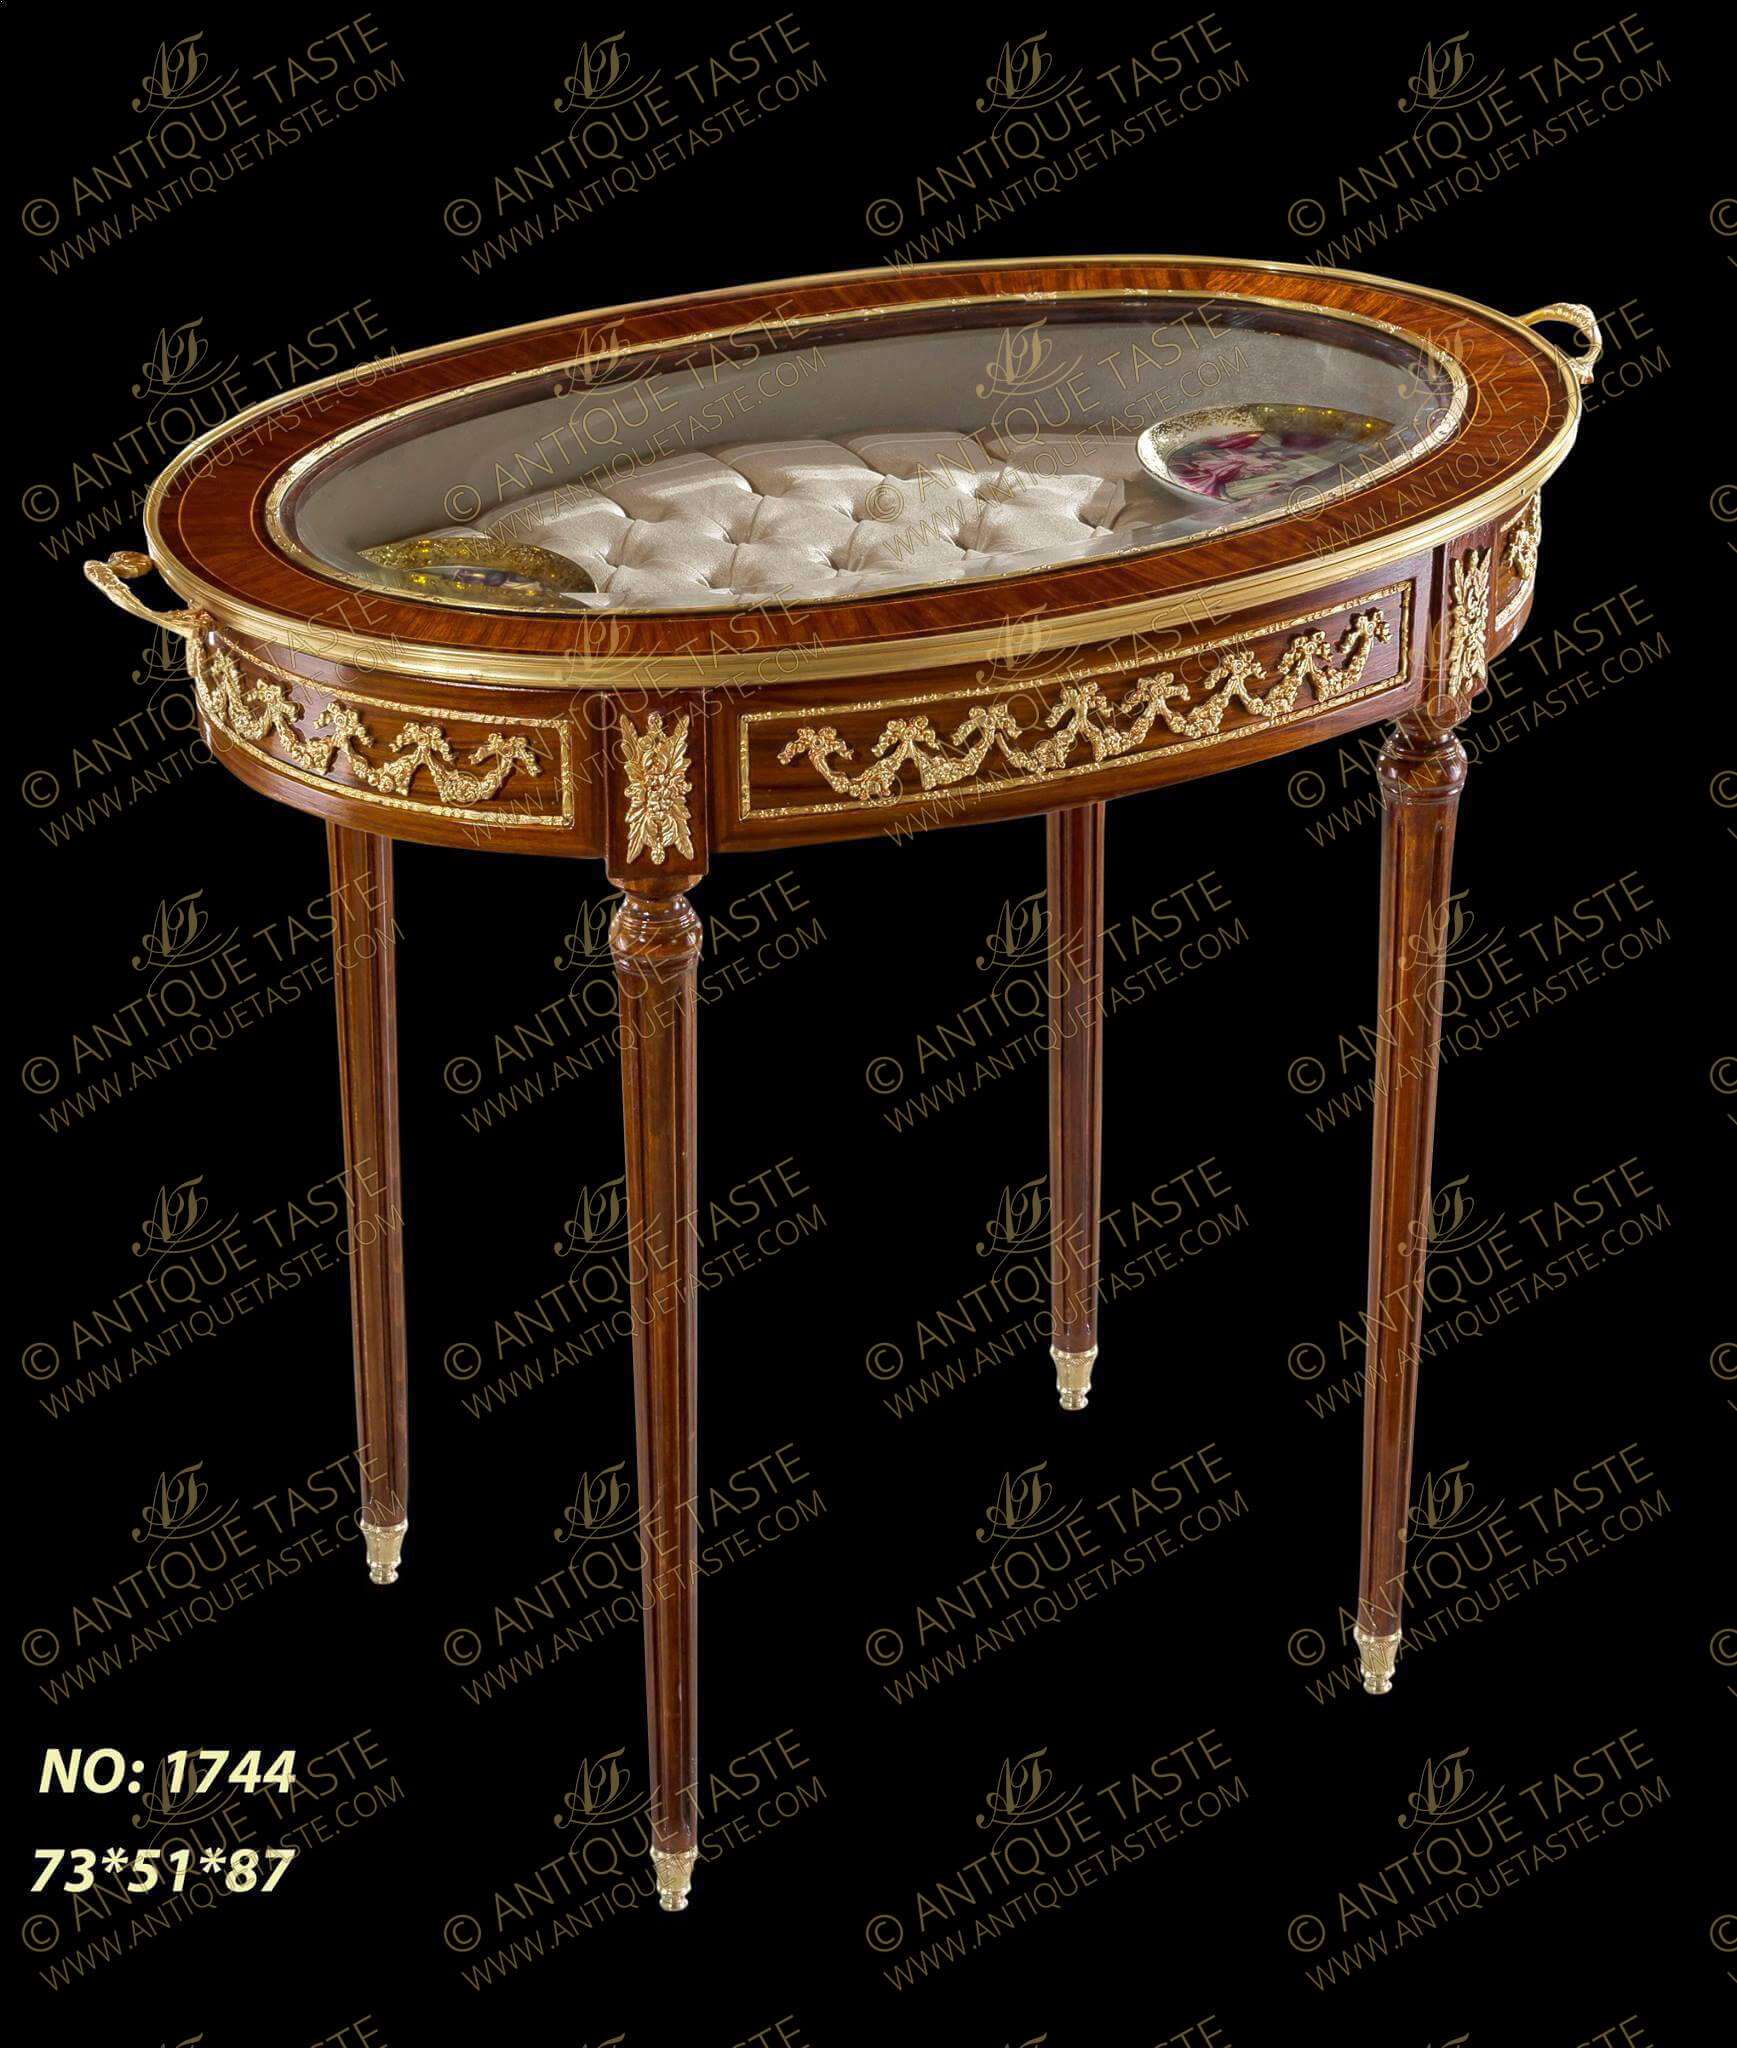 French Louis XVI style ormolu mounted oval shape bijouterie